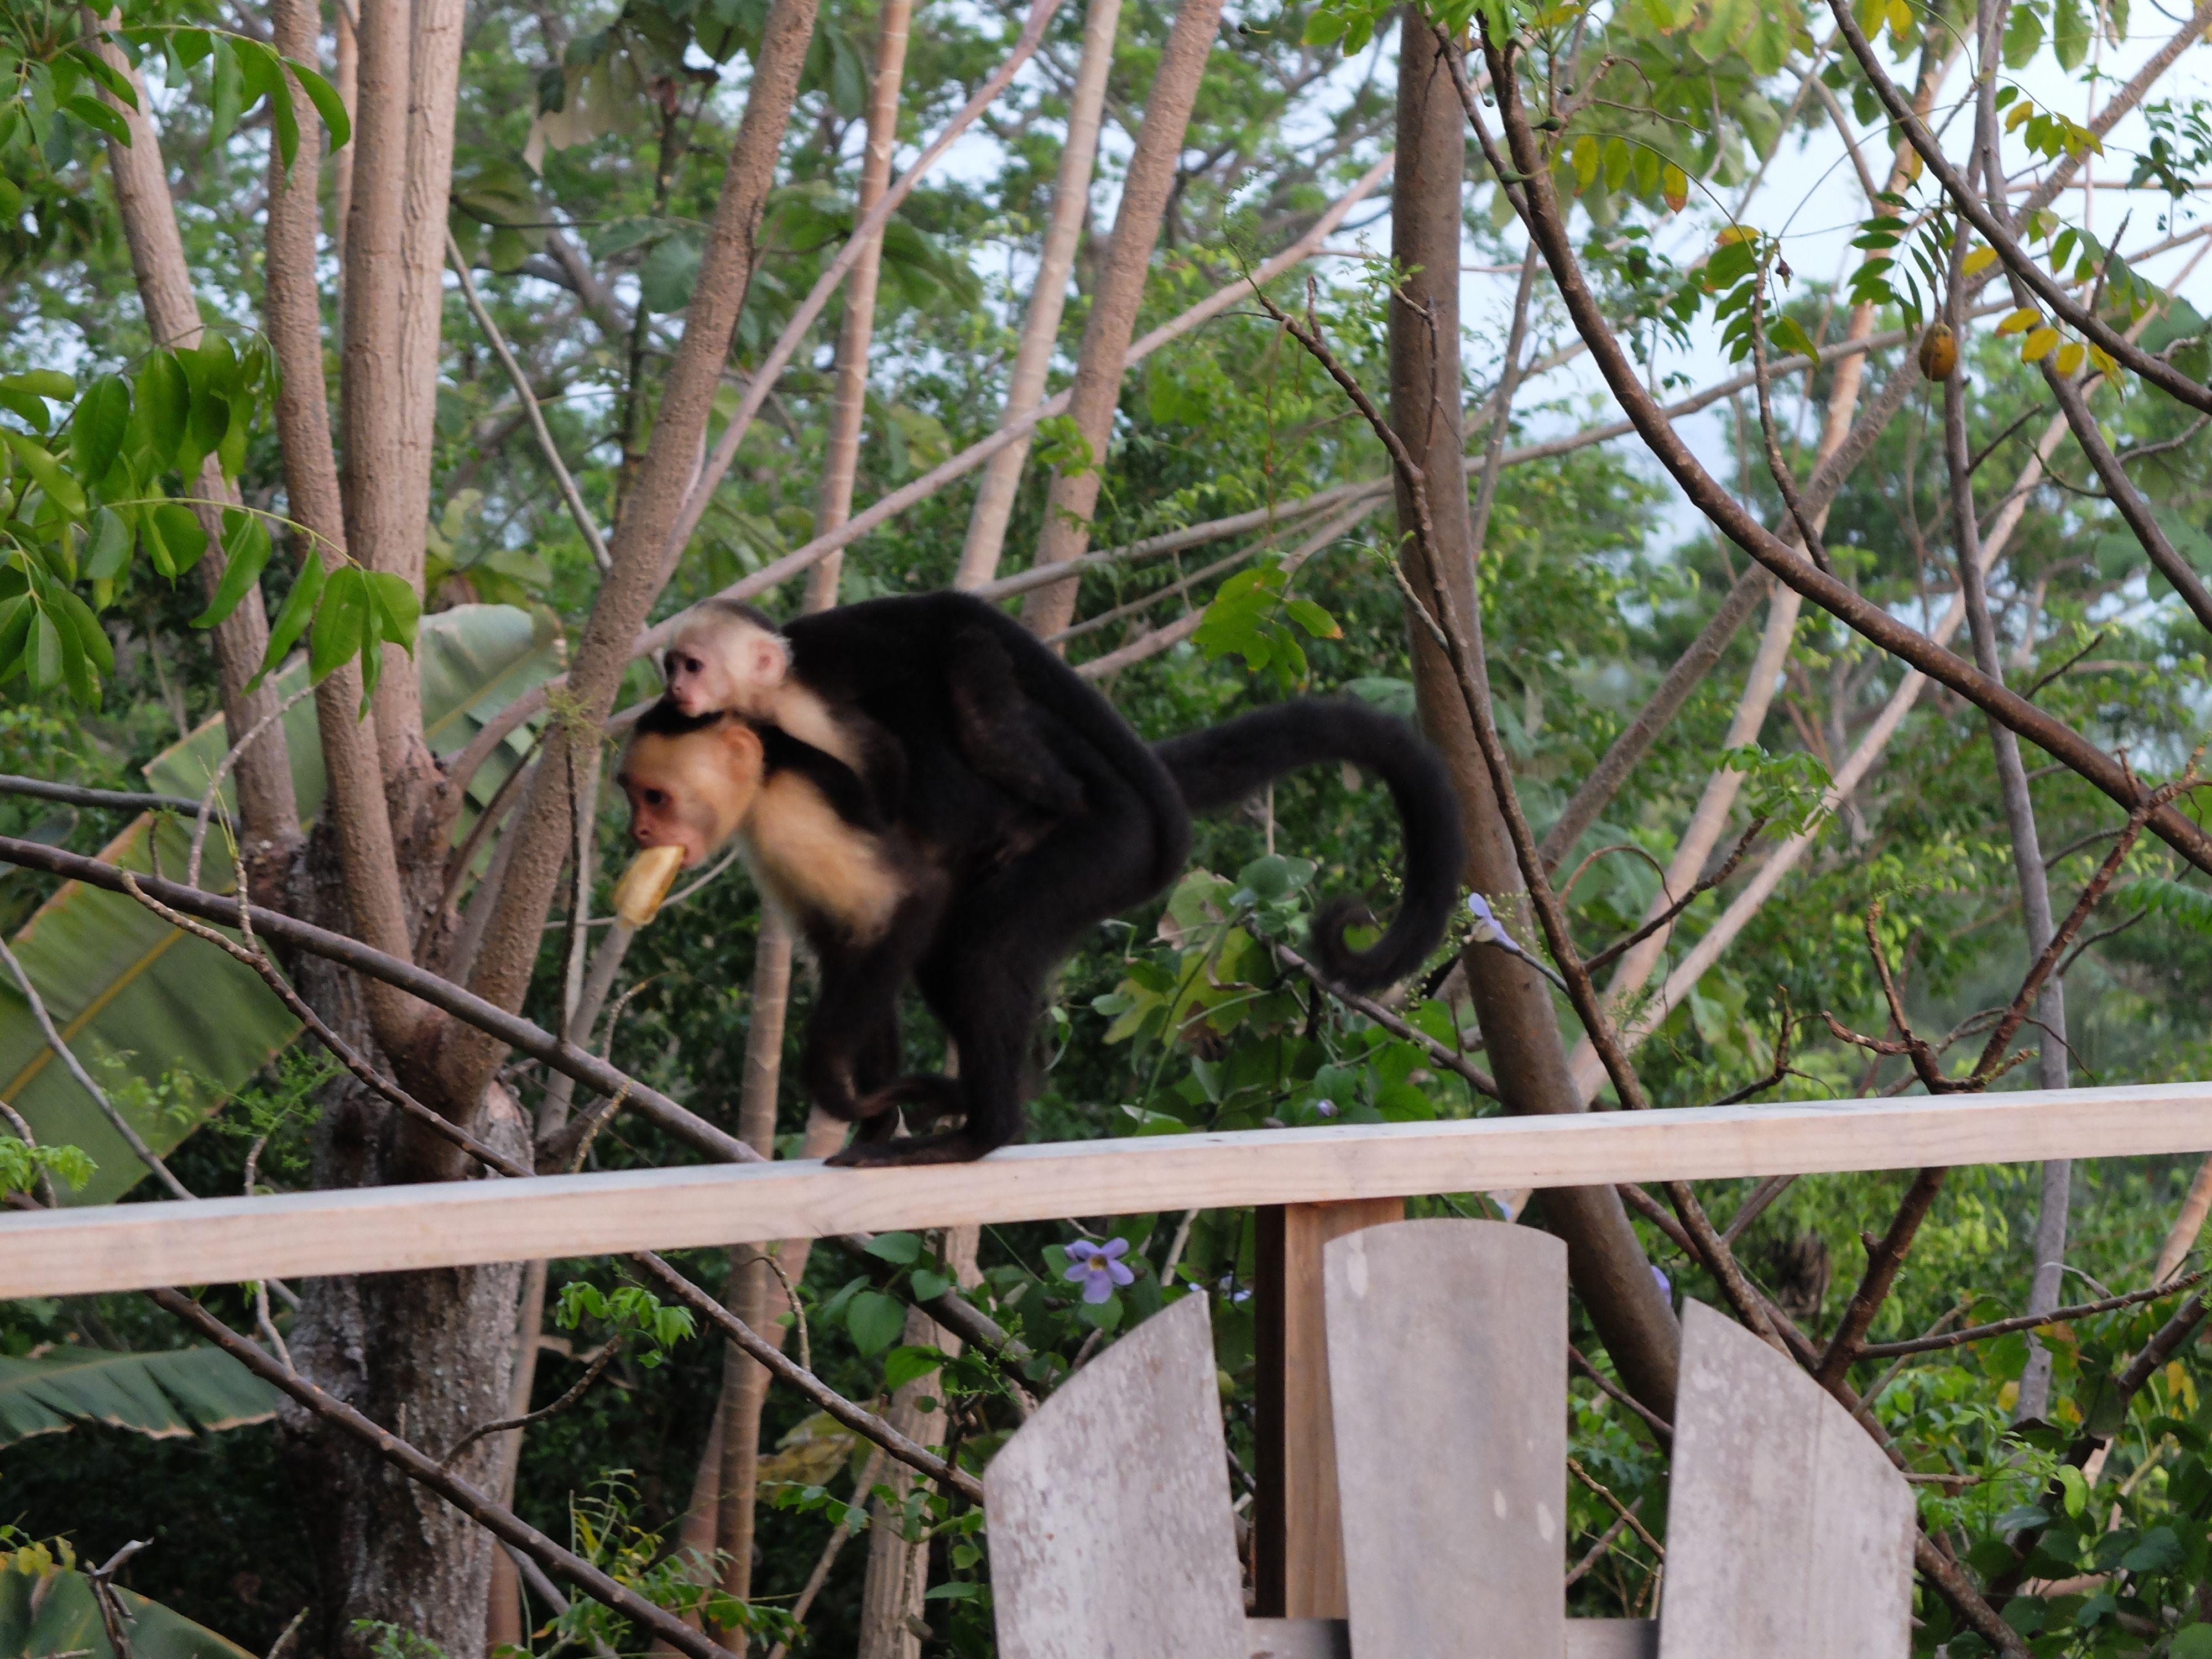 Capuchin Monkeys At Lookout Inn Carate Beach Hotel Osa Peninsula Corcovado National